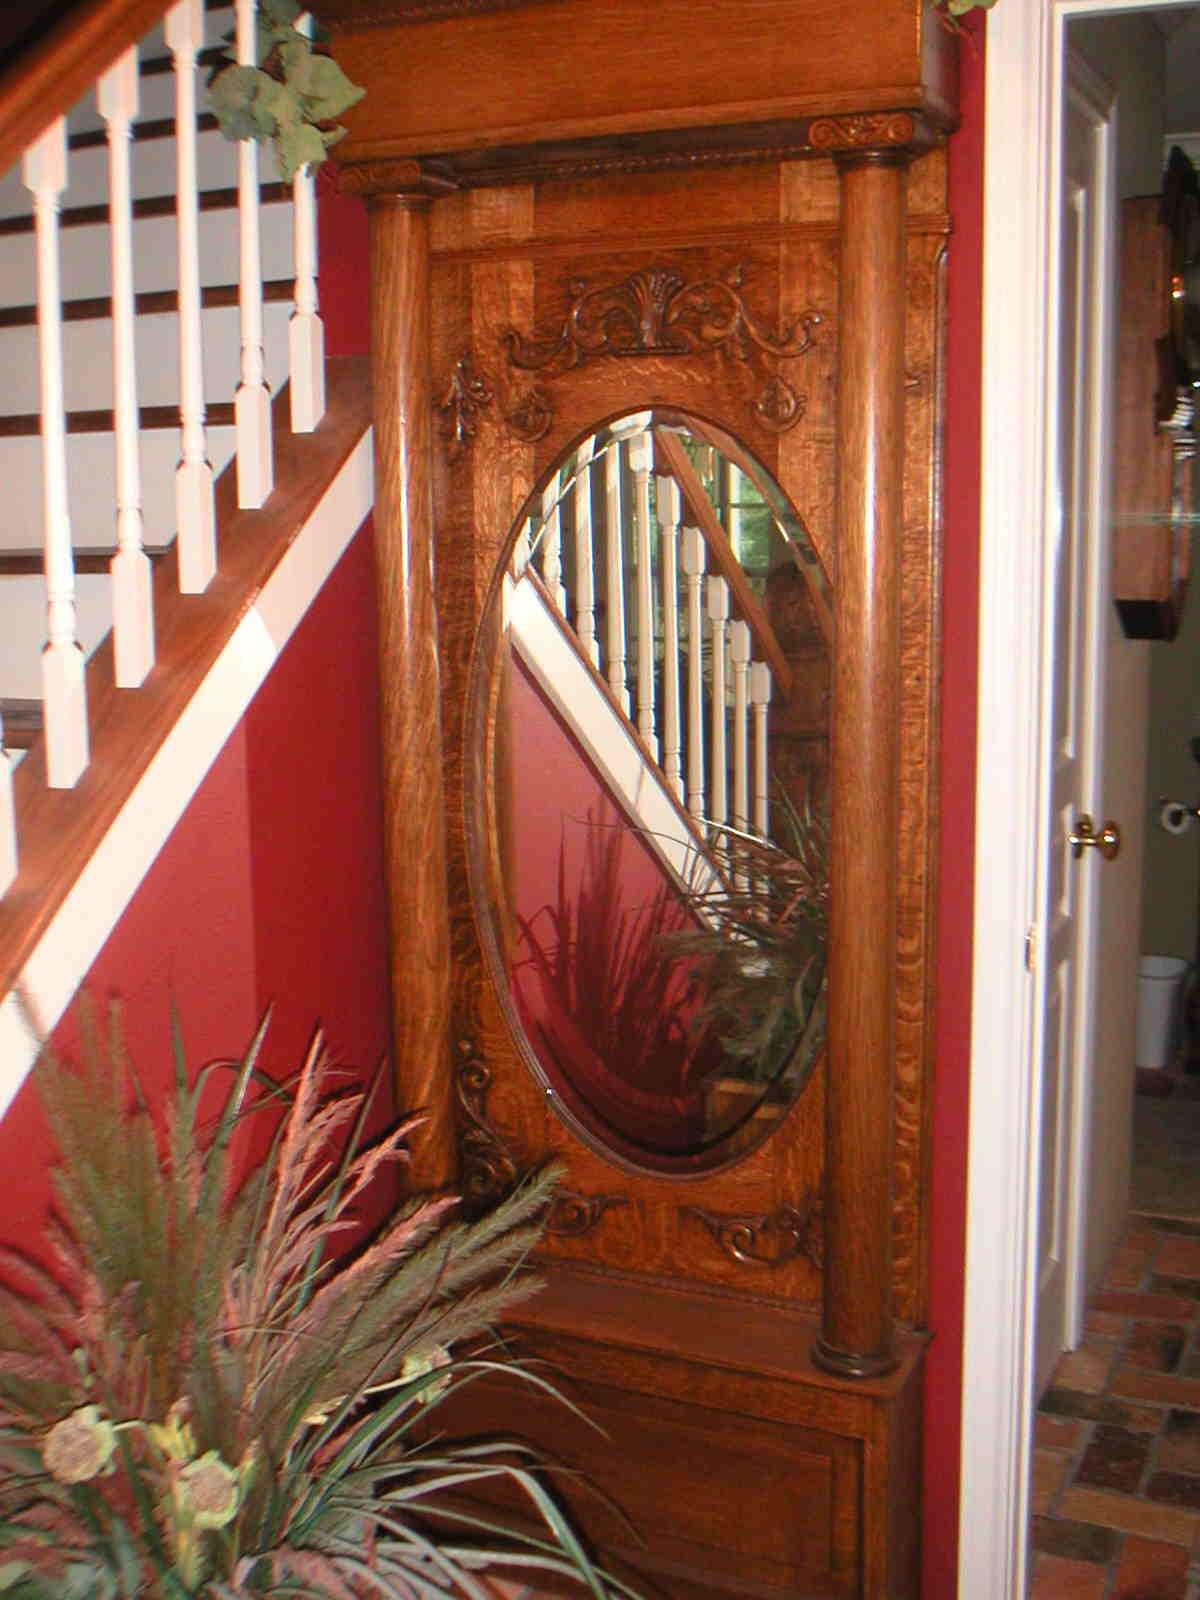 Wooden Heart Antique Furniture 3